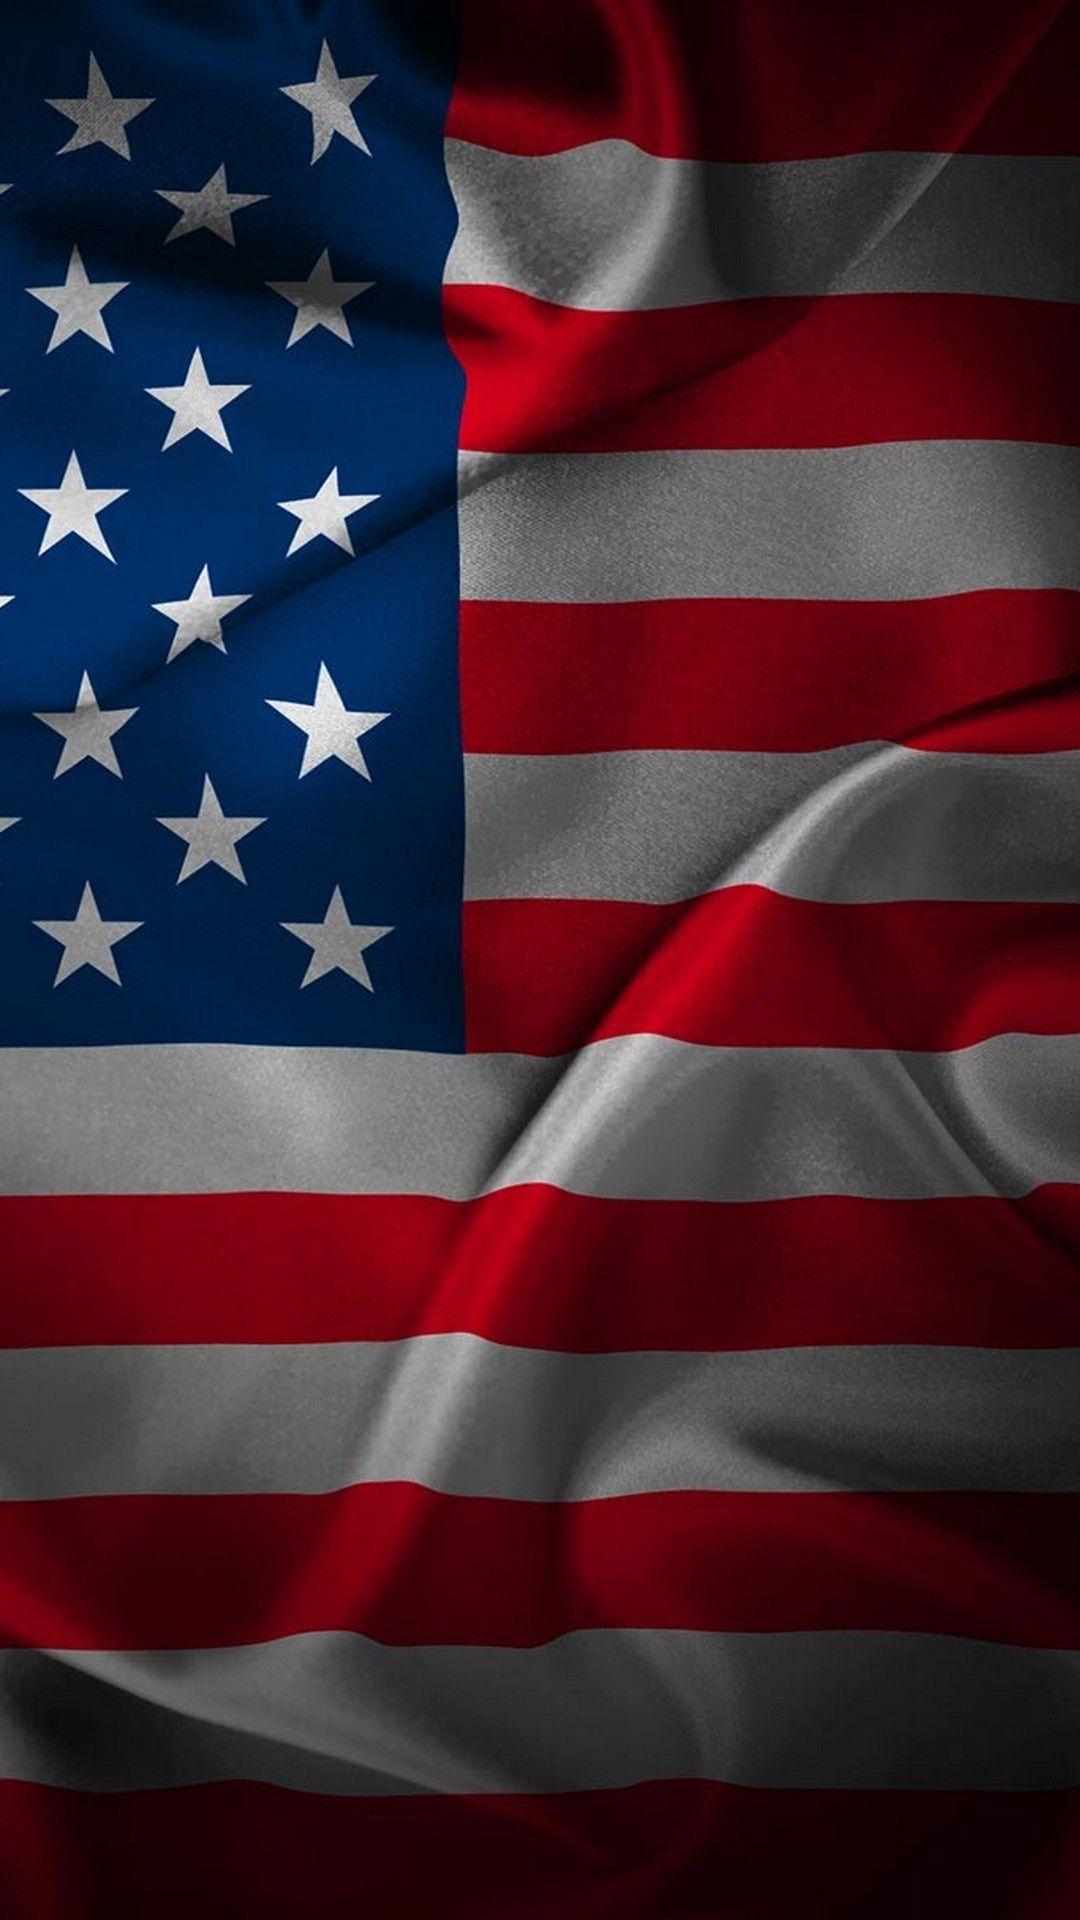 American Flag Wallpaper For Phones American Flag Wallpaper